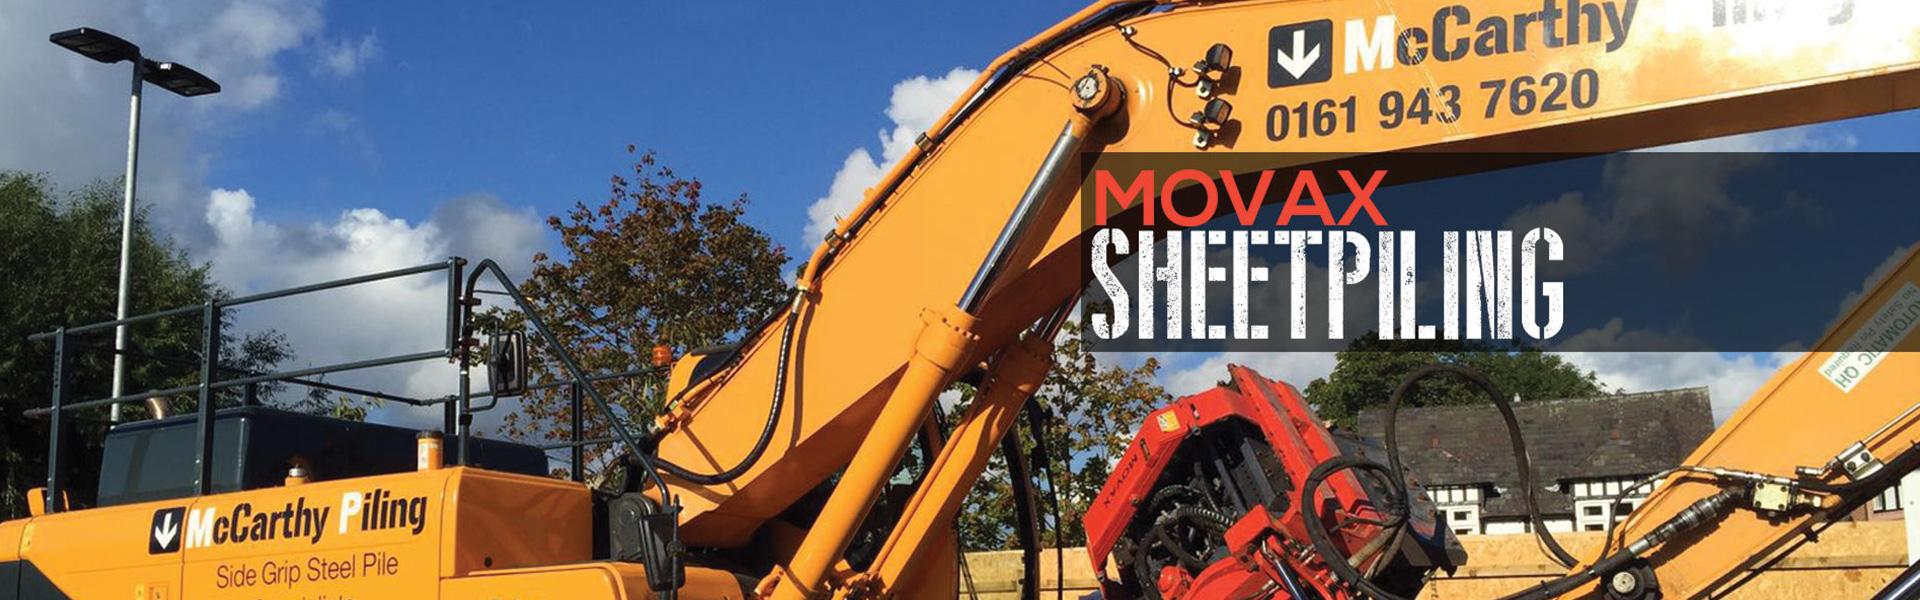 Movax Sheet Piling